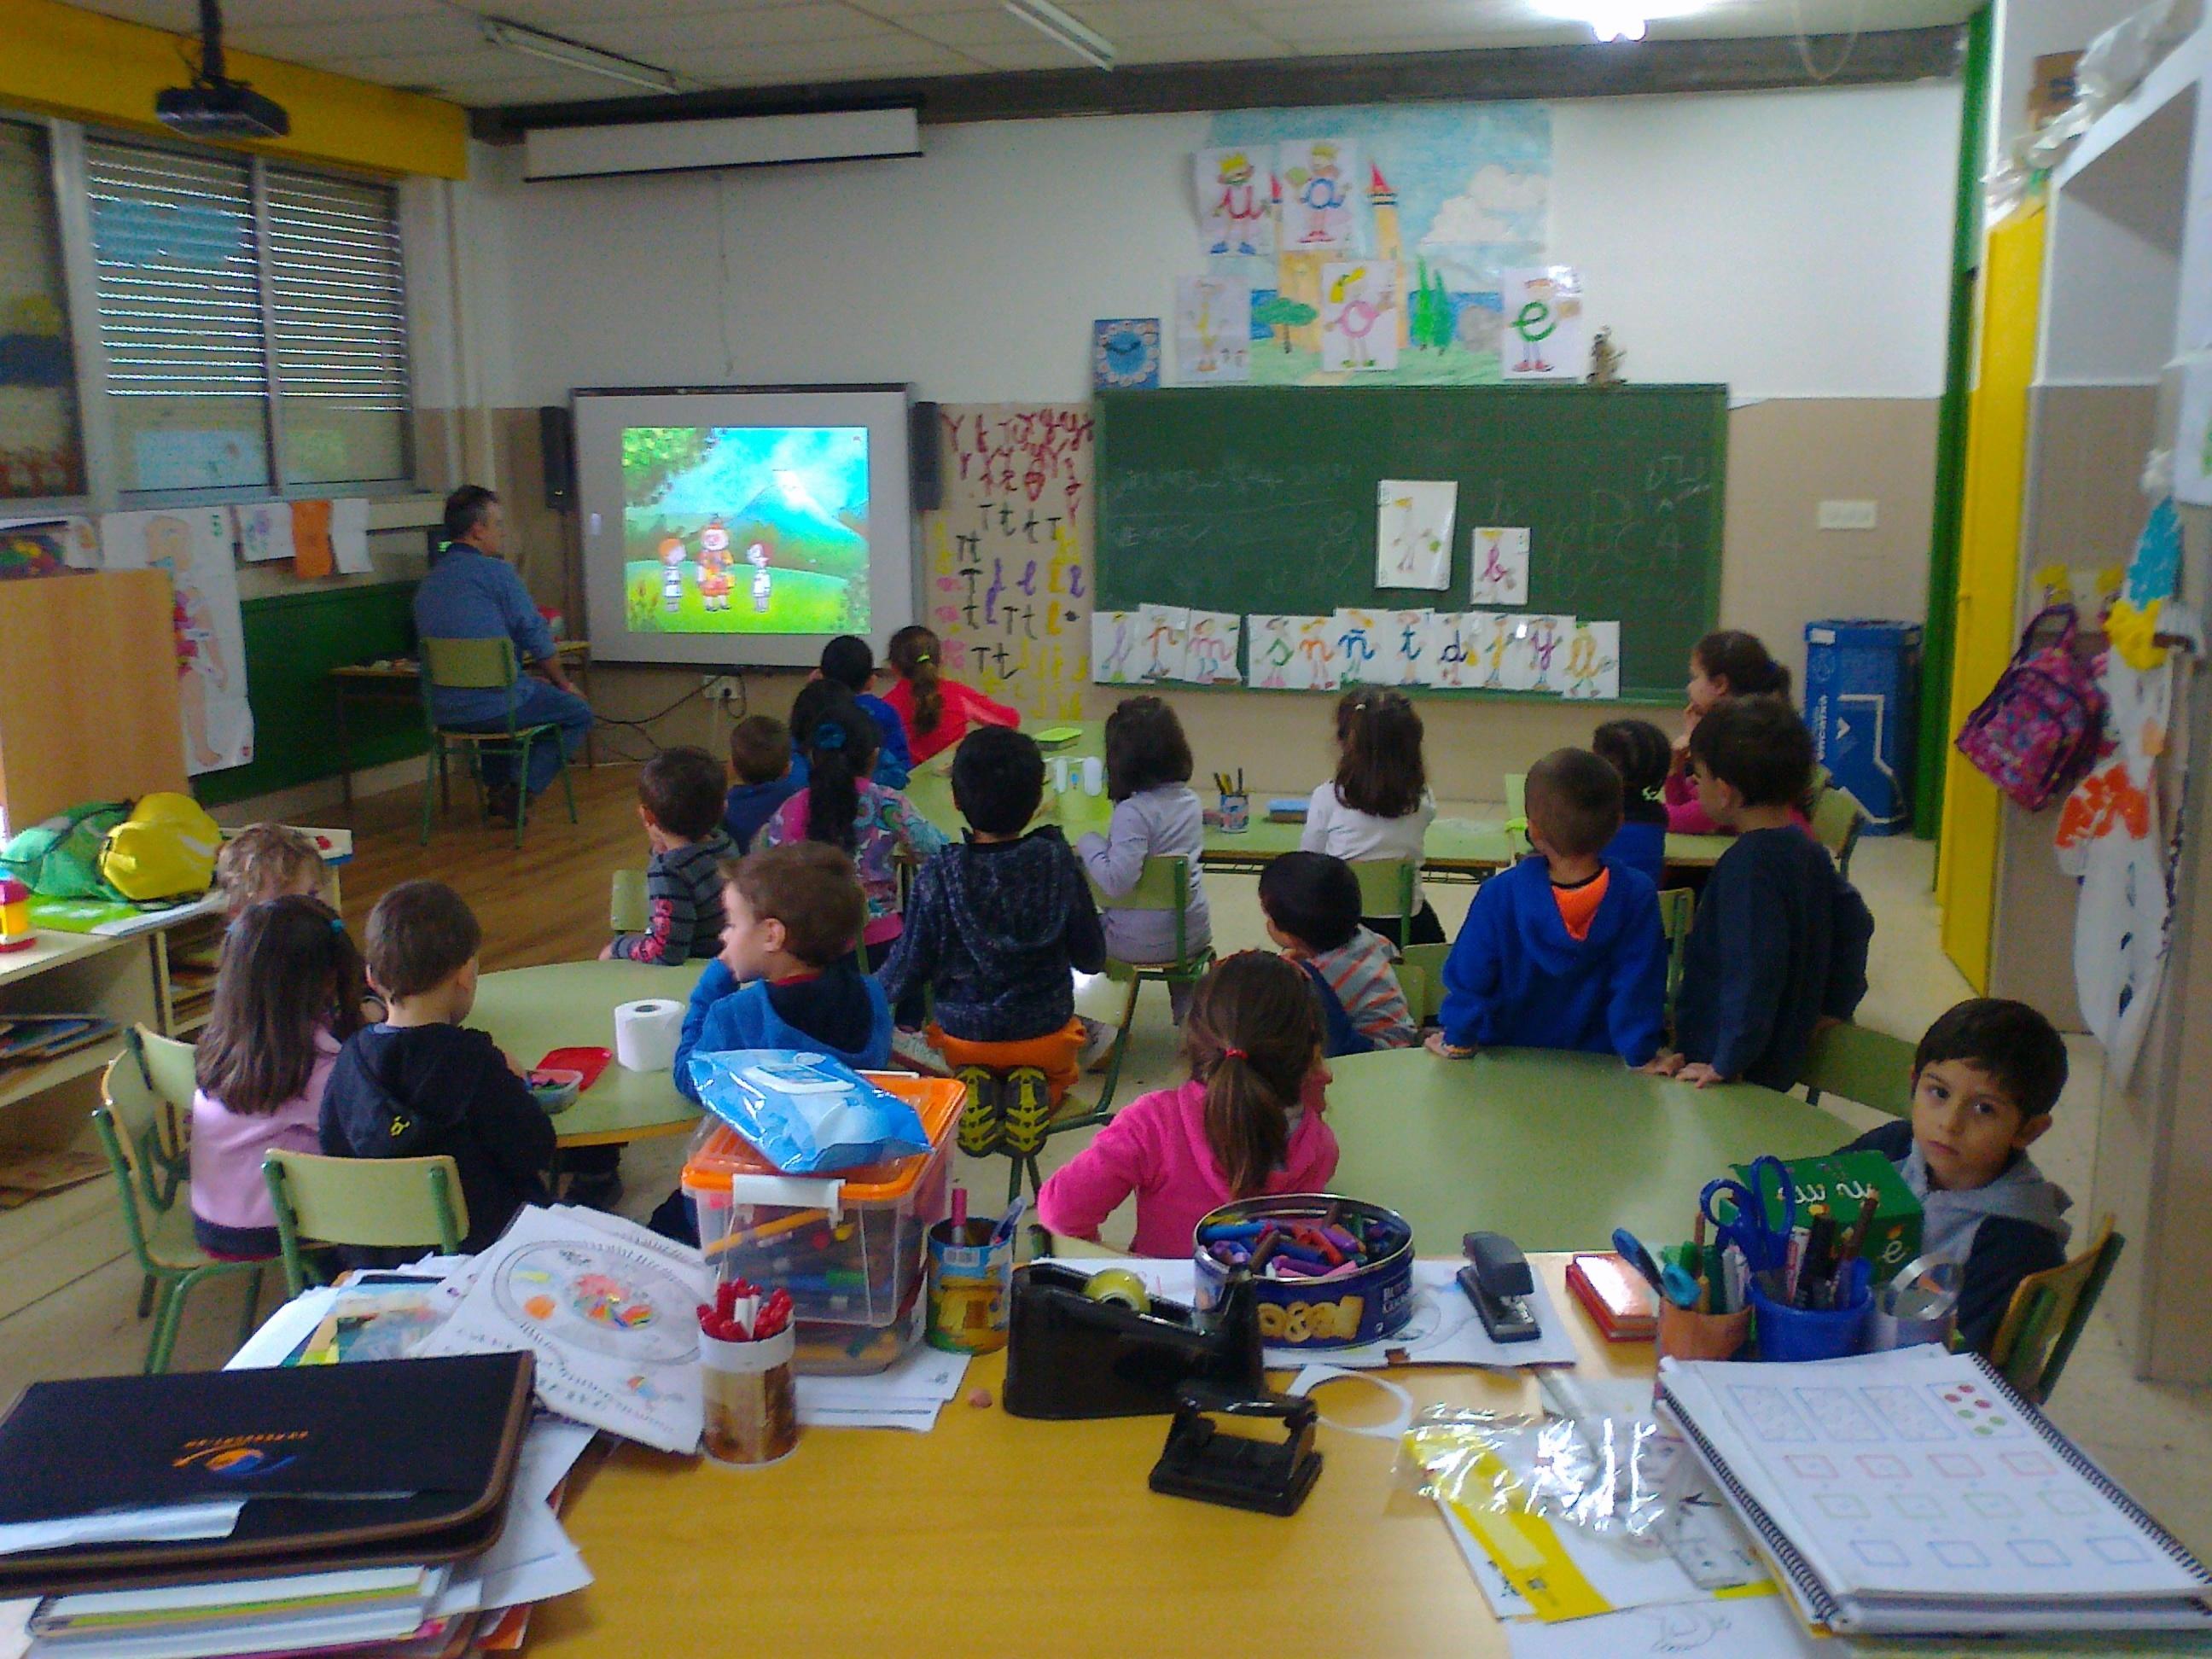 Aprender-2014 211 (1)